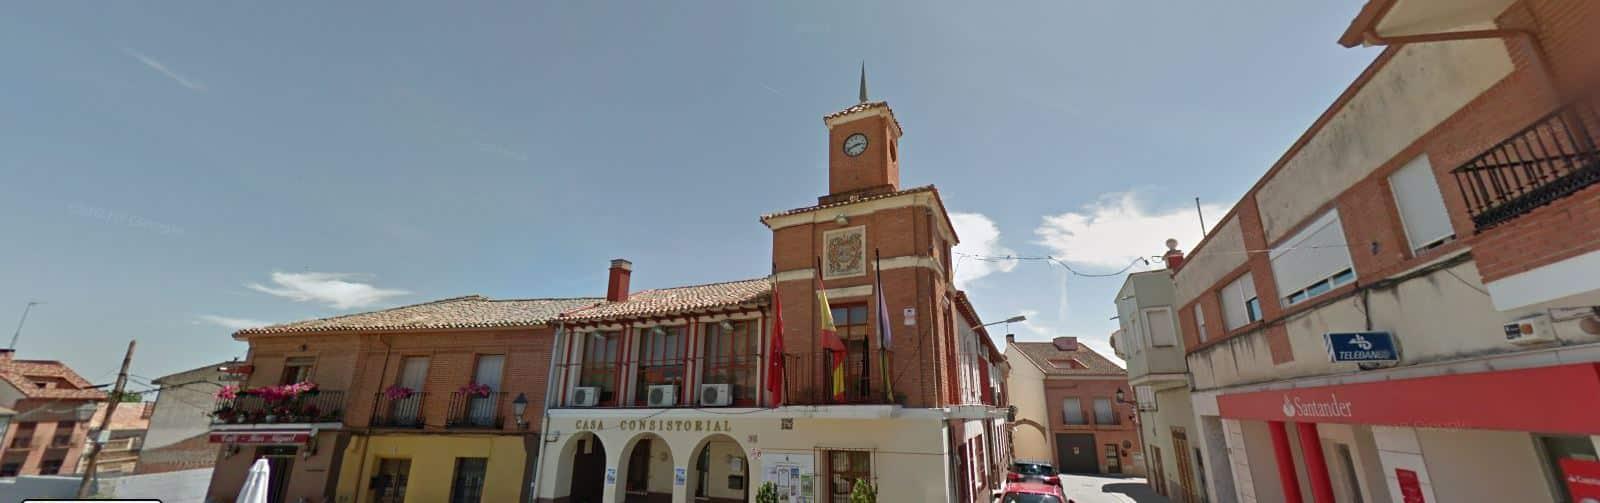 Registro civil - Ayuntamiento Ajalvir